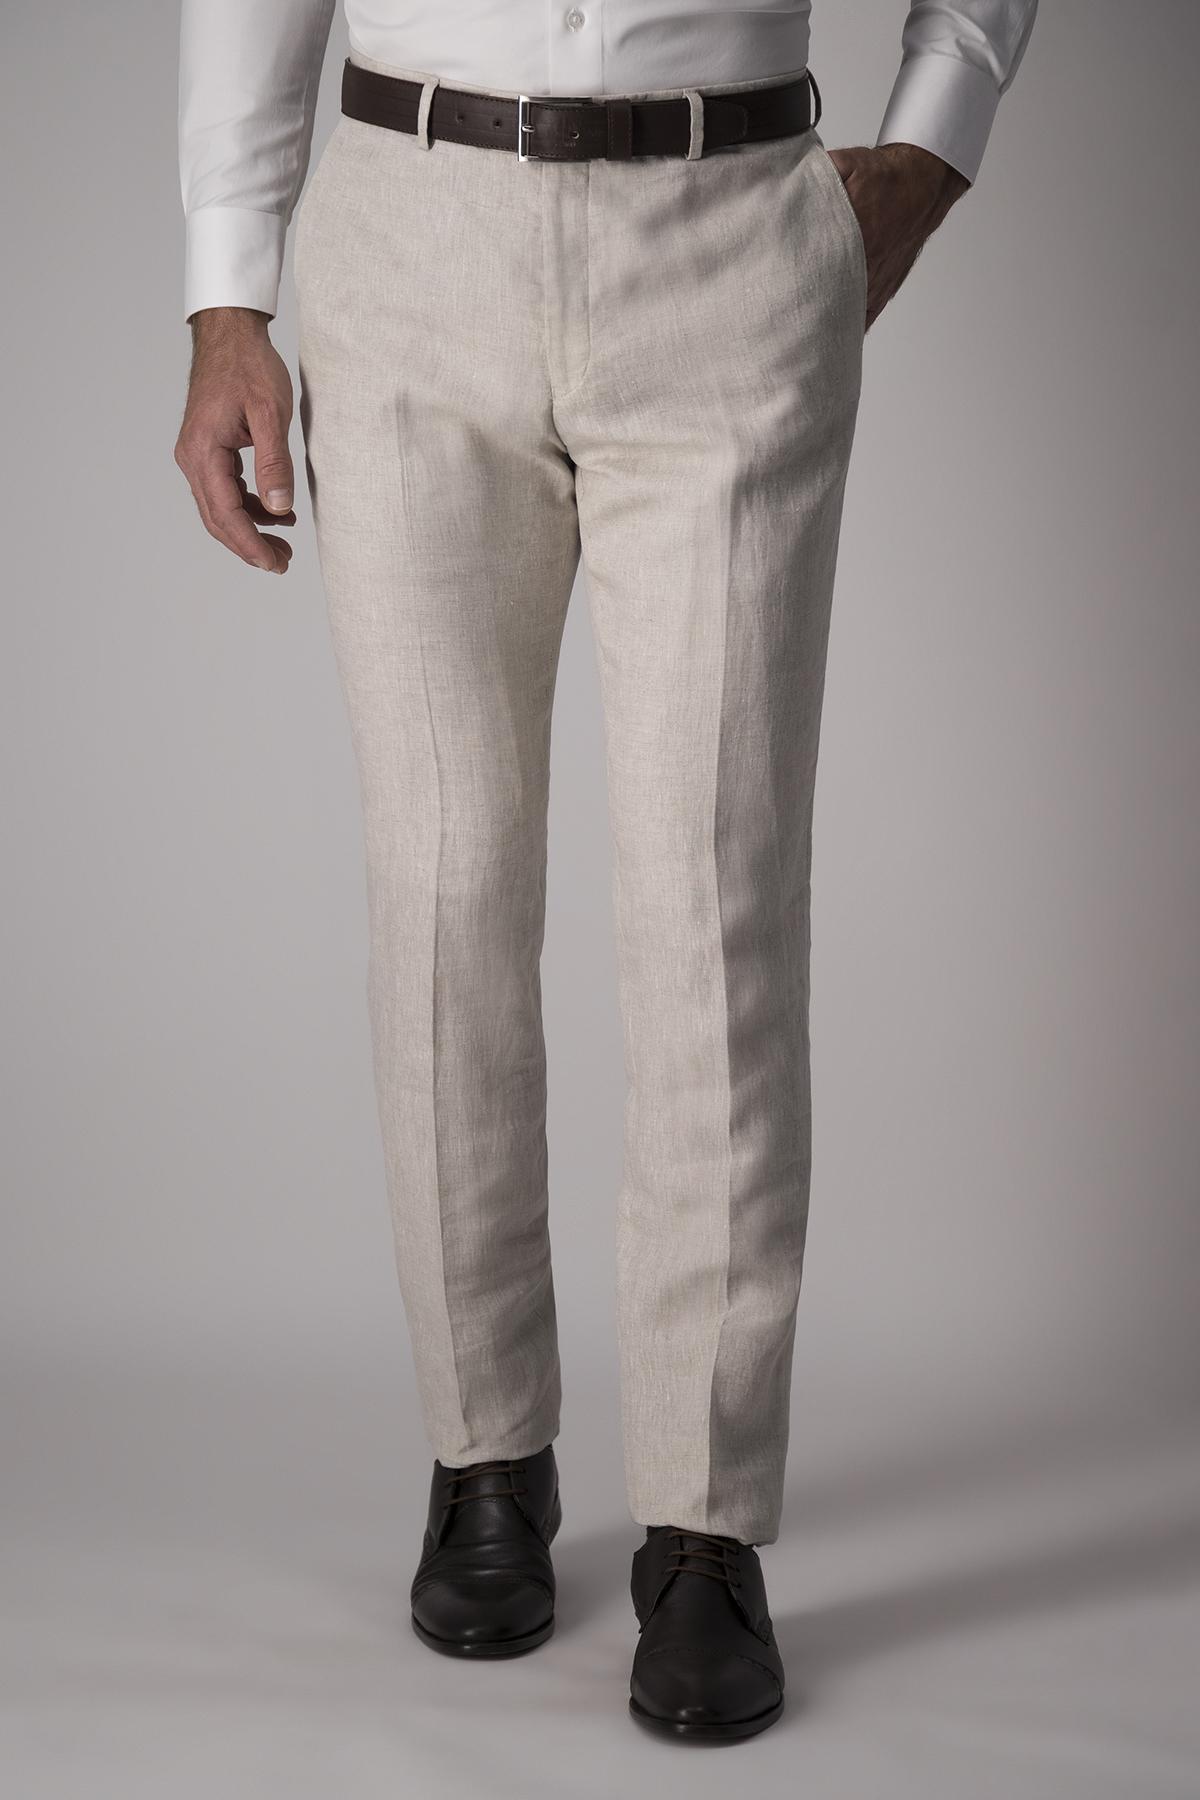 Pantalón Robert´s, slim fit, 100% lino, color beige.